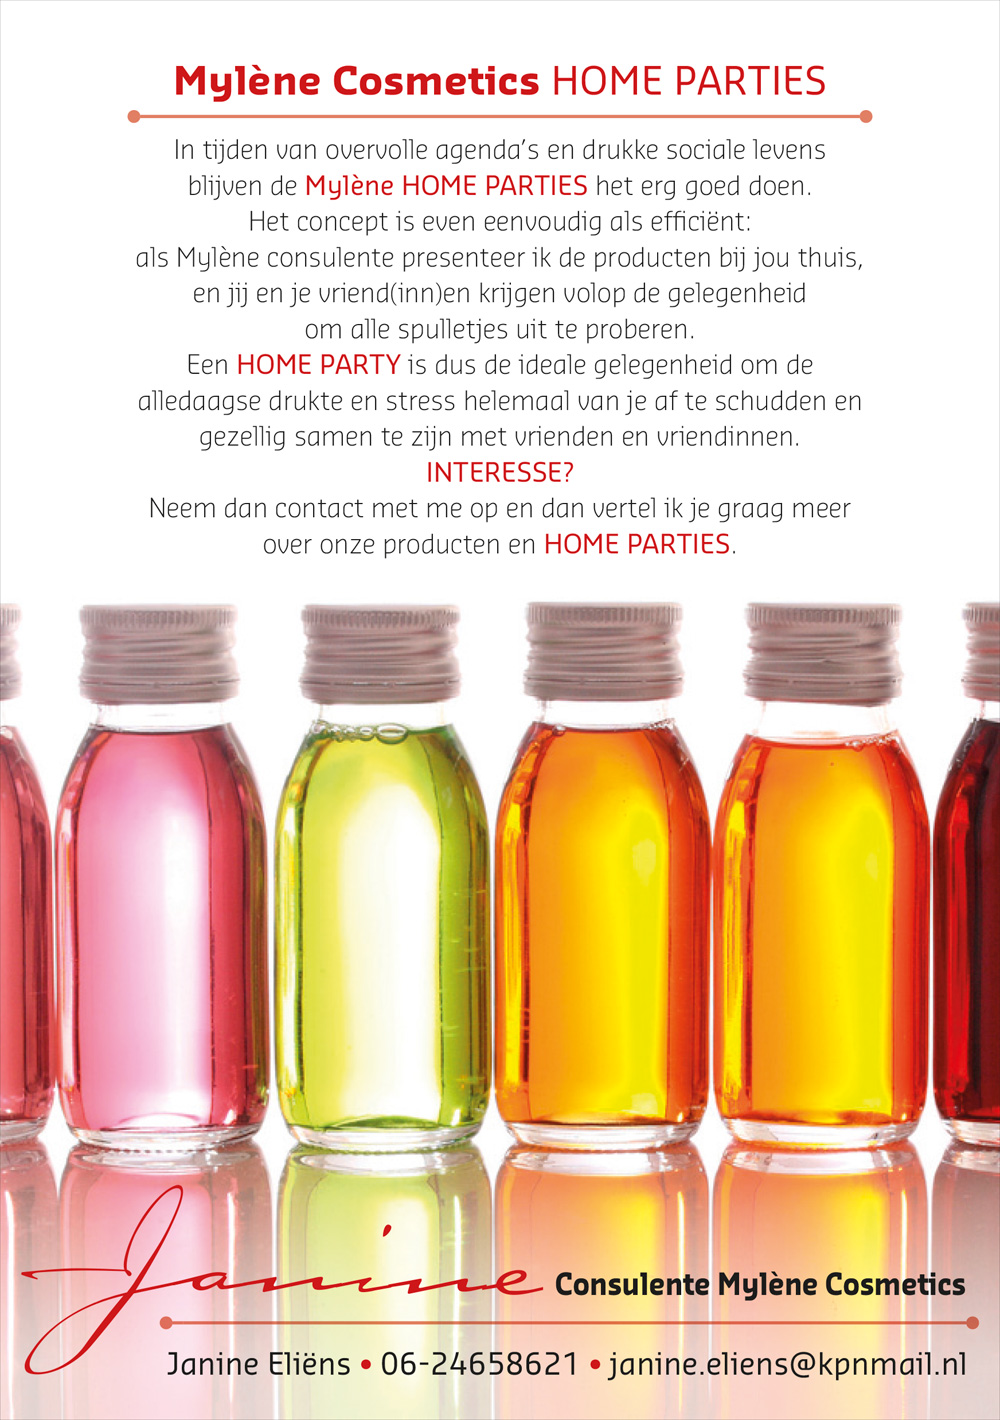 Mylène Cosmetics - Flyer